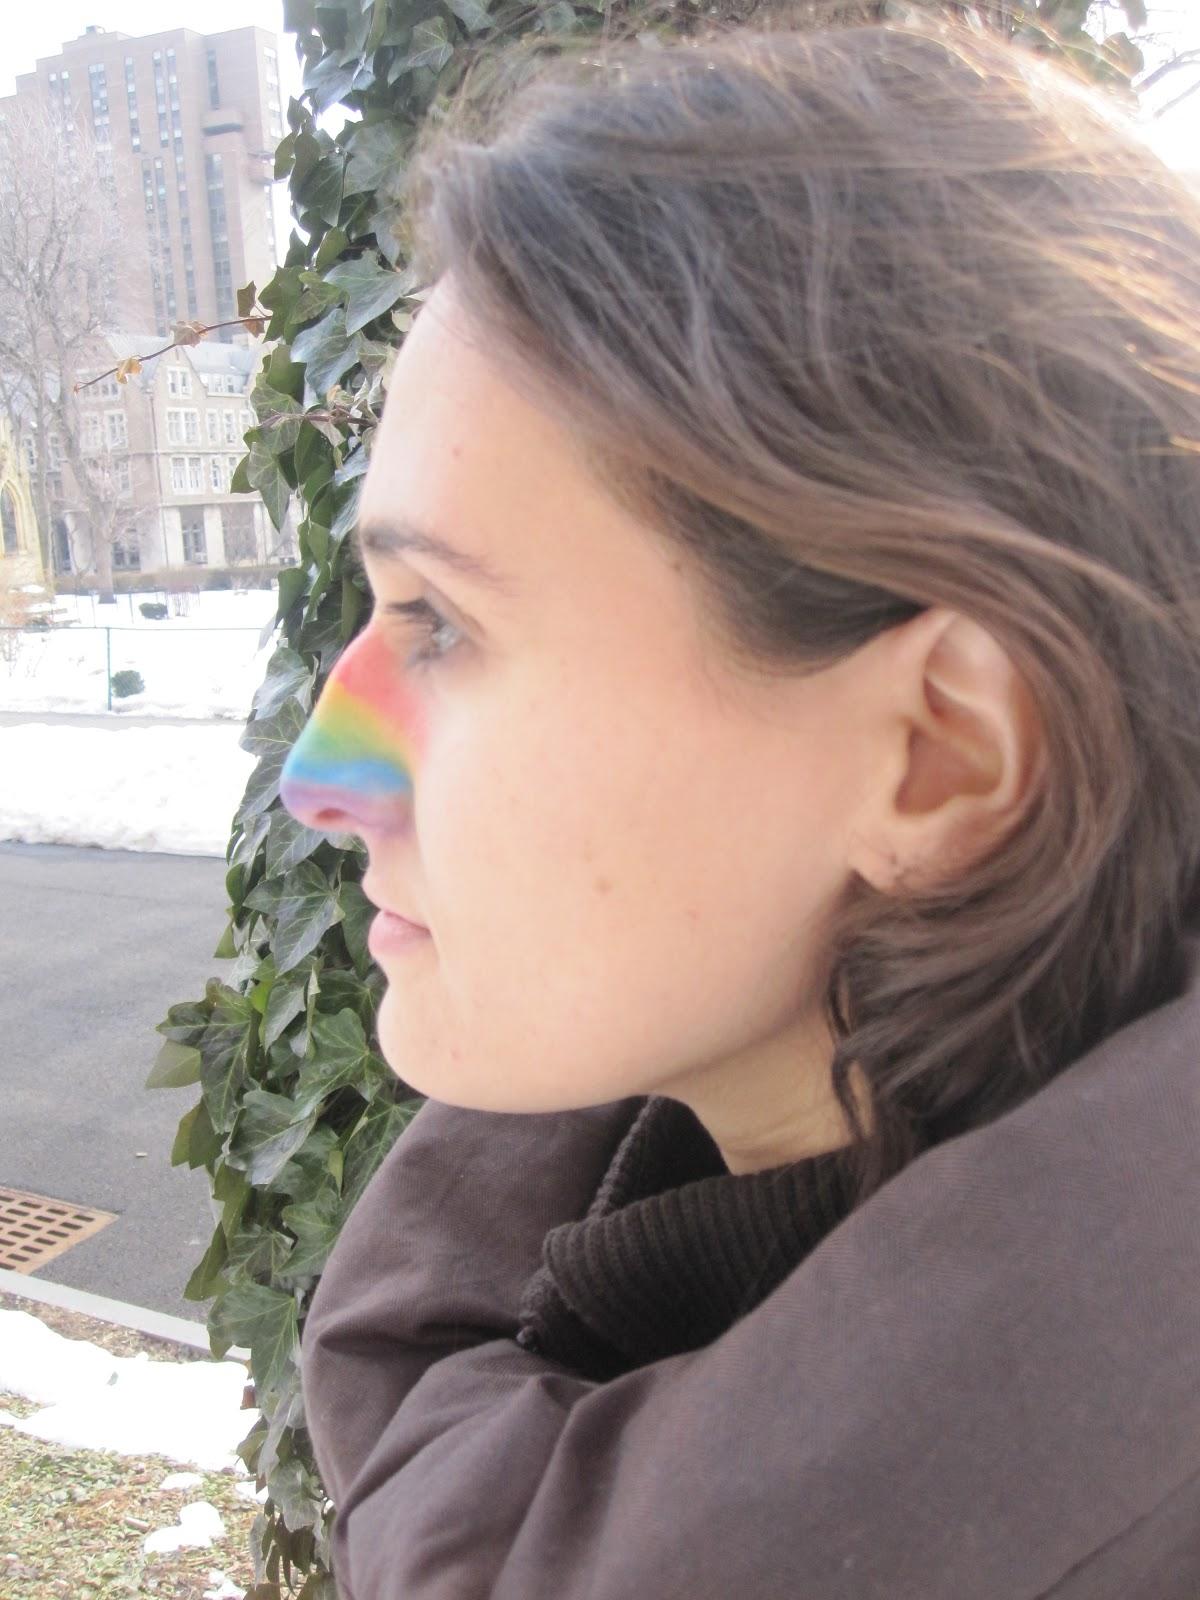 Jewish nose girl xxx authoritative message